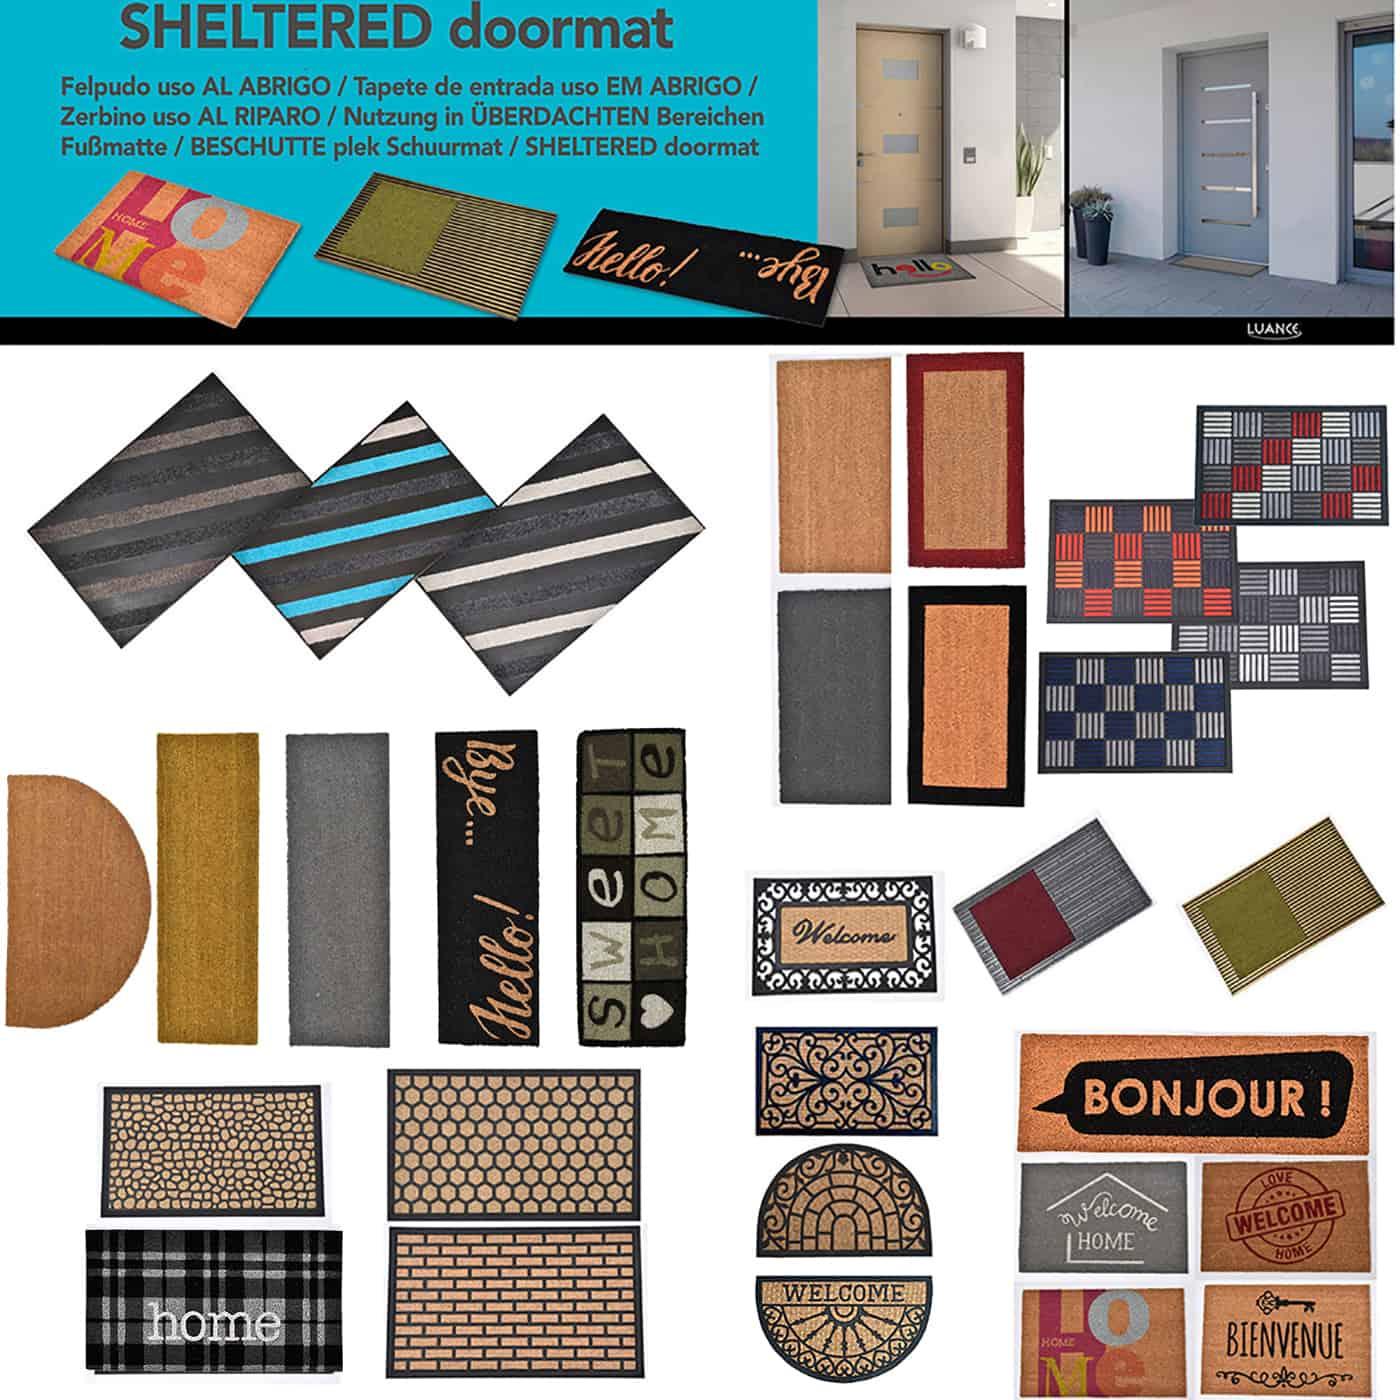 Sheltered Front Door Mat Coir Coco Fibers Rug 24x13 Natural-Border Black